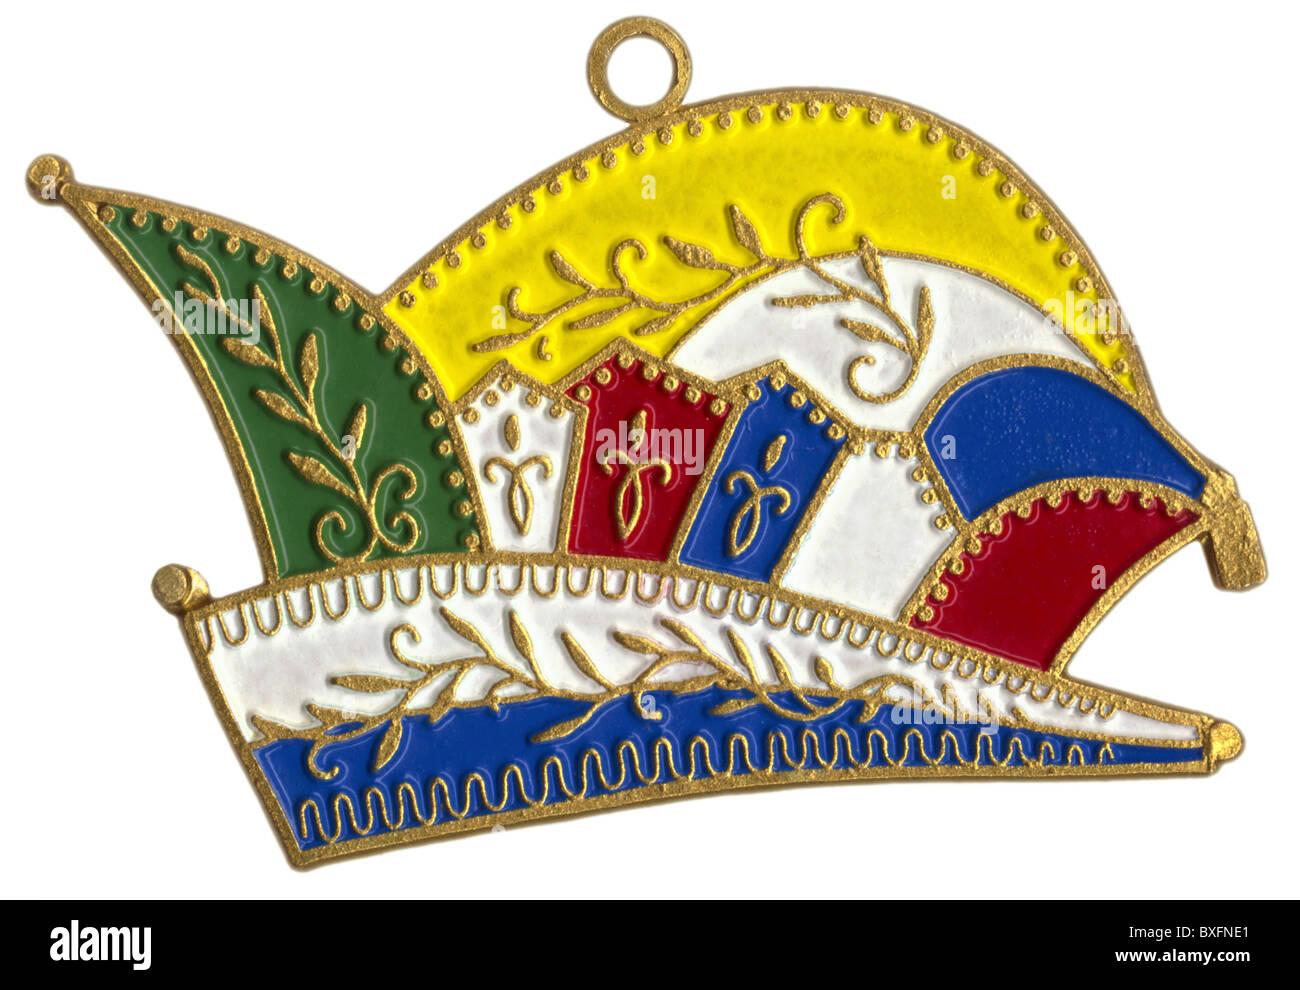 Karneval, duncecap, Prinz Kappe, Emaille stick, 80er, 80er, 20. Jahrhundert, historische, historische, Faschingsdienstag, Stockbild